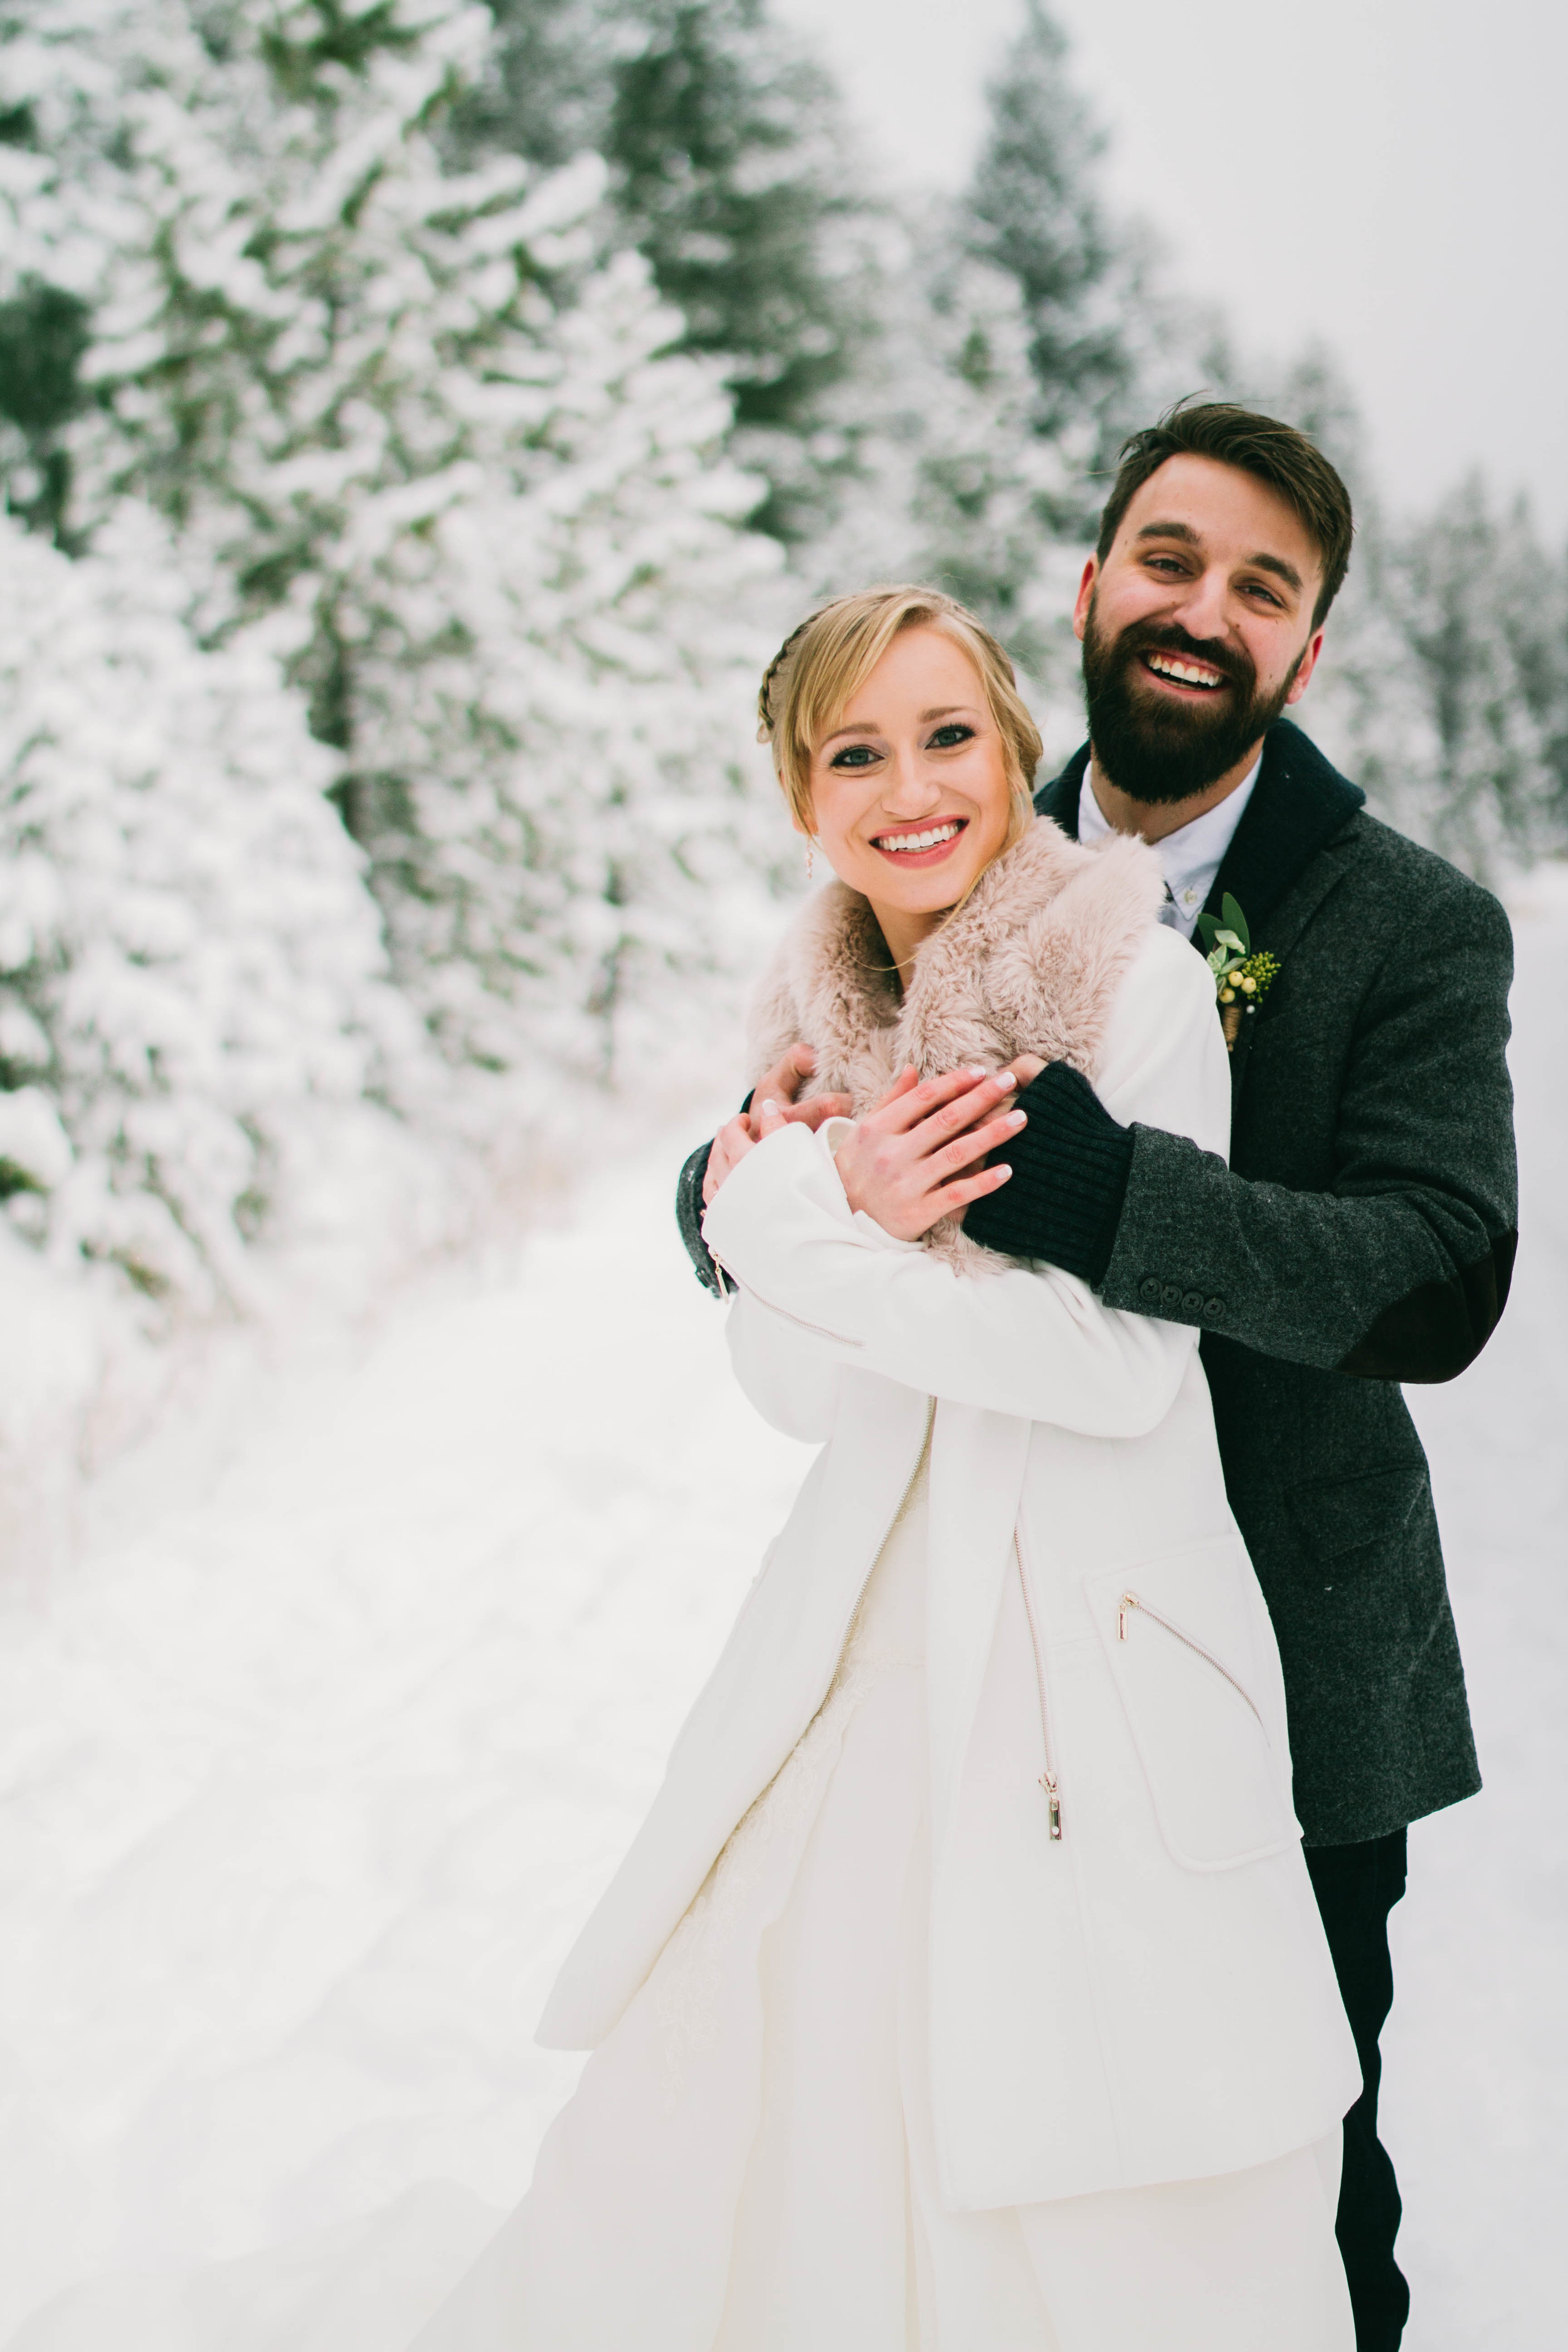 Bonin Wedding - Madeleine Bonin Photography-5837.jpg